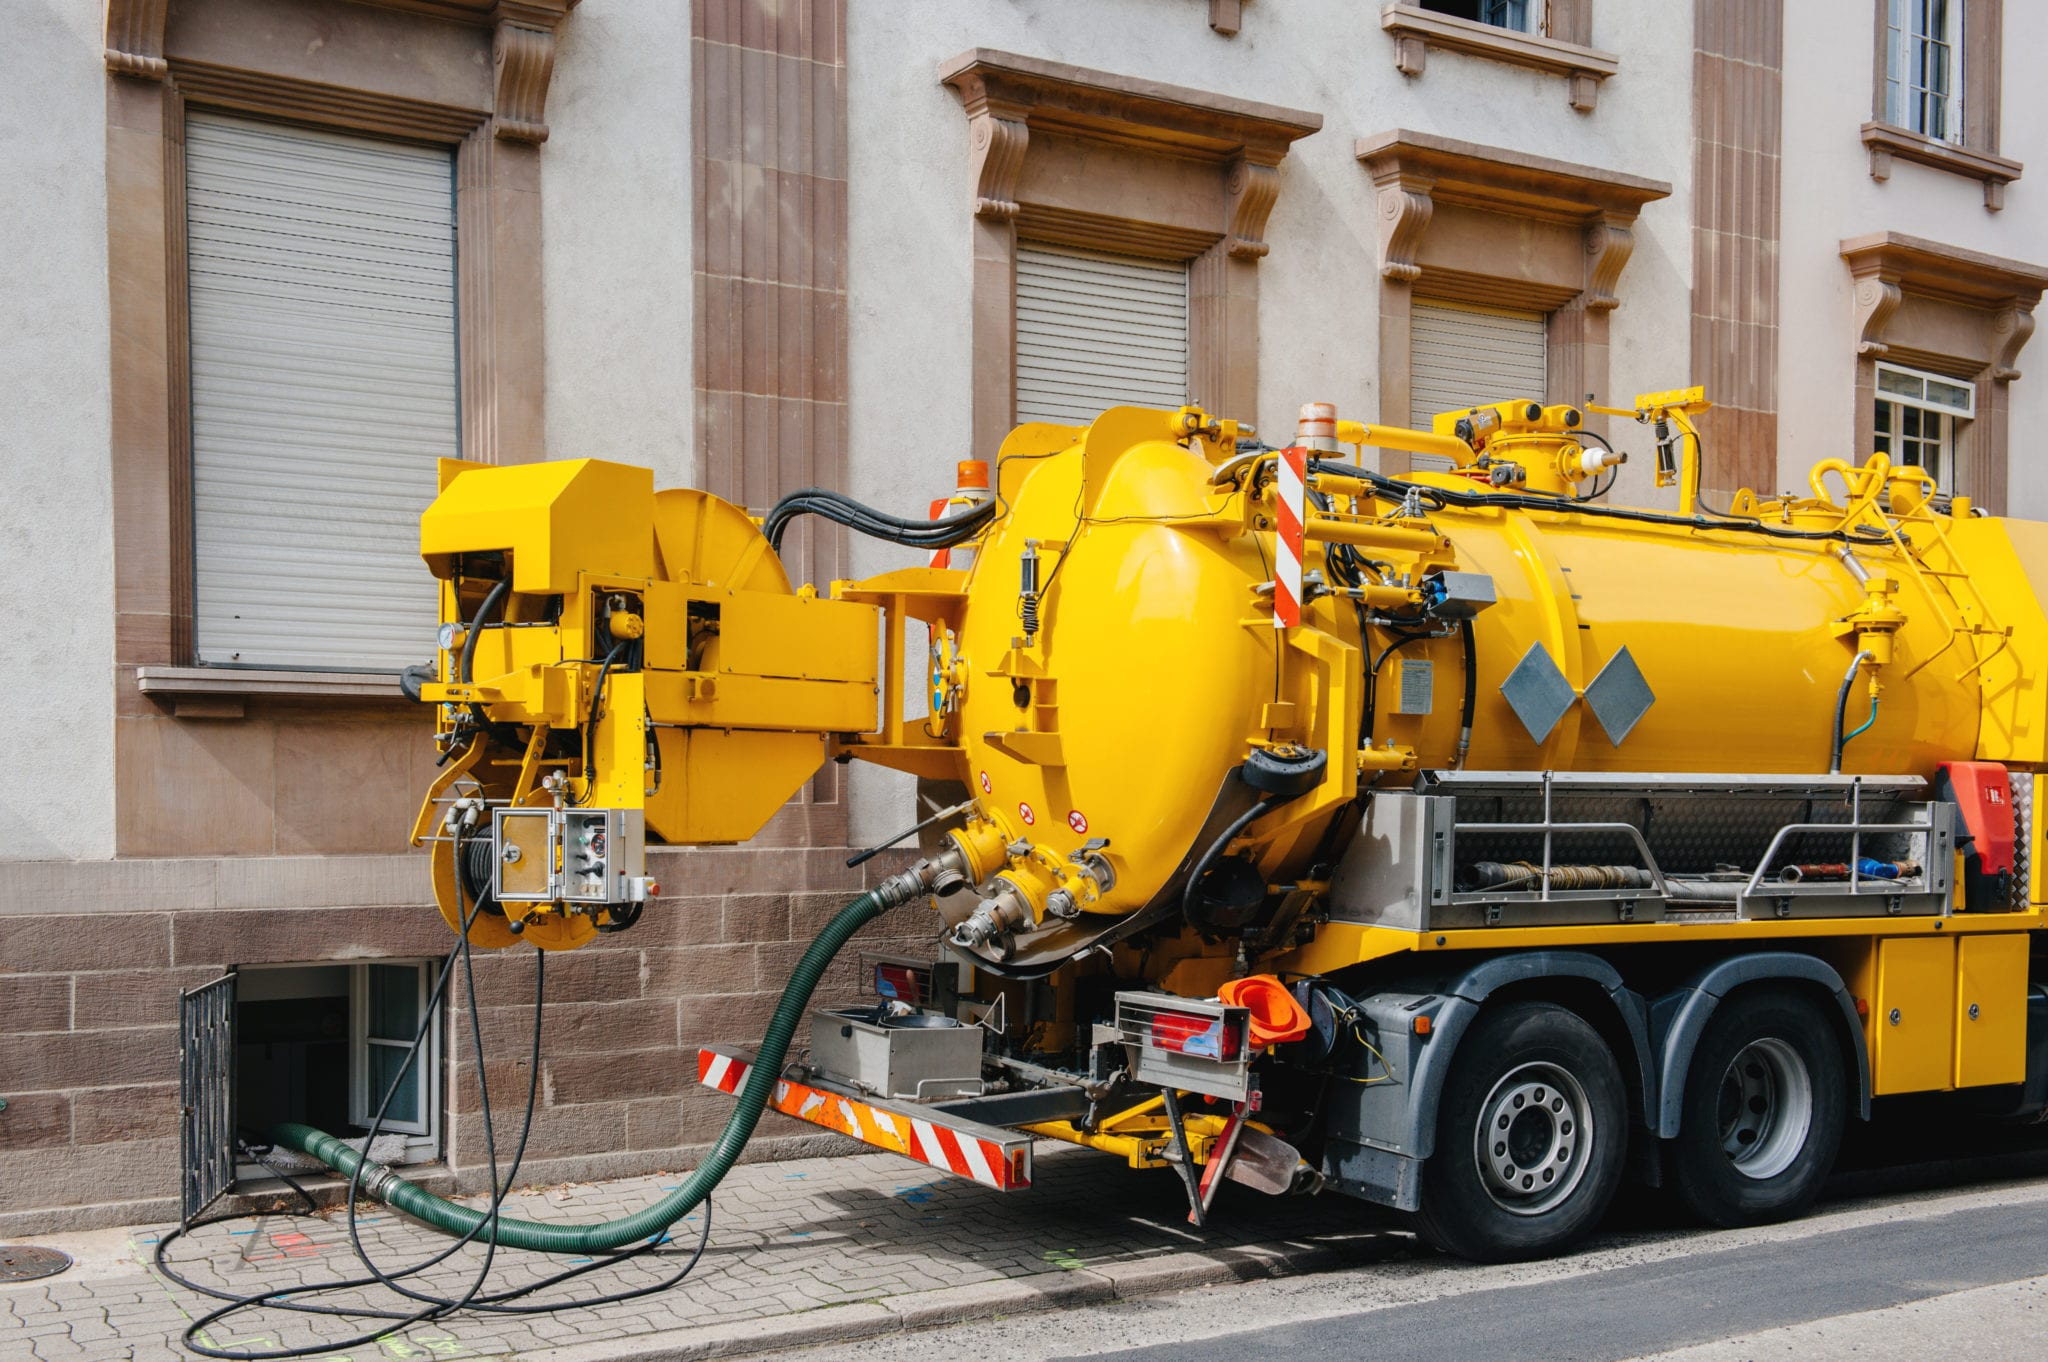 professional sewage cleanup company